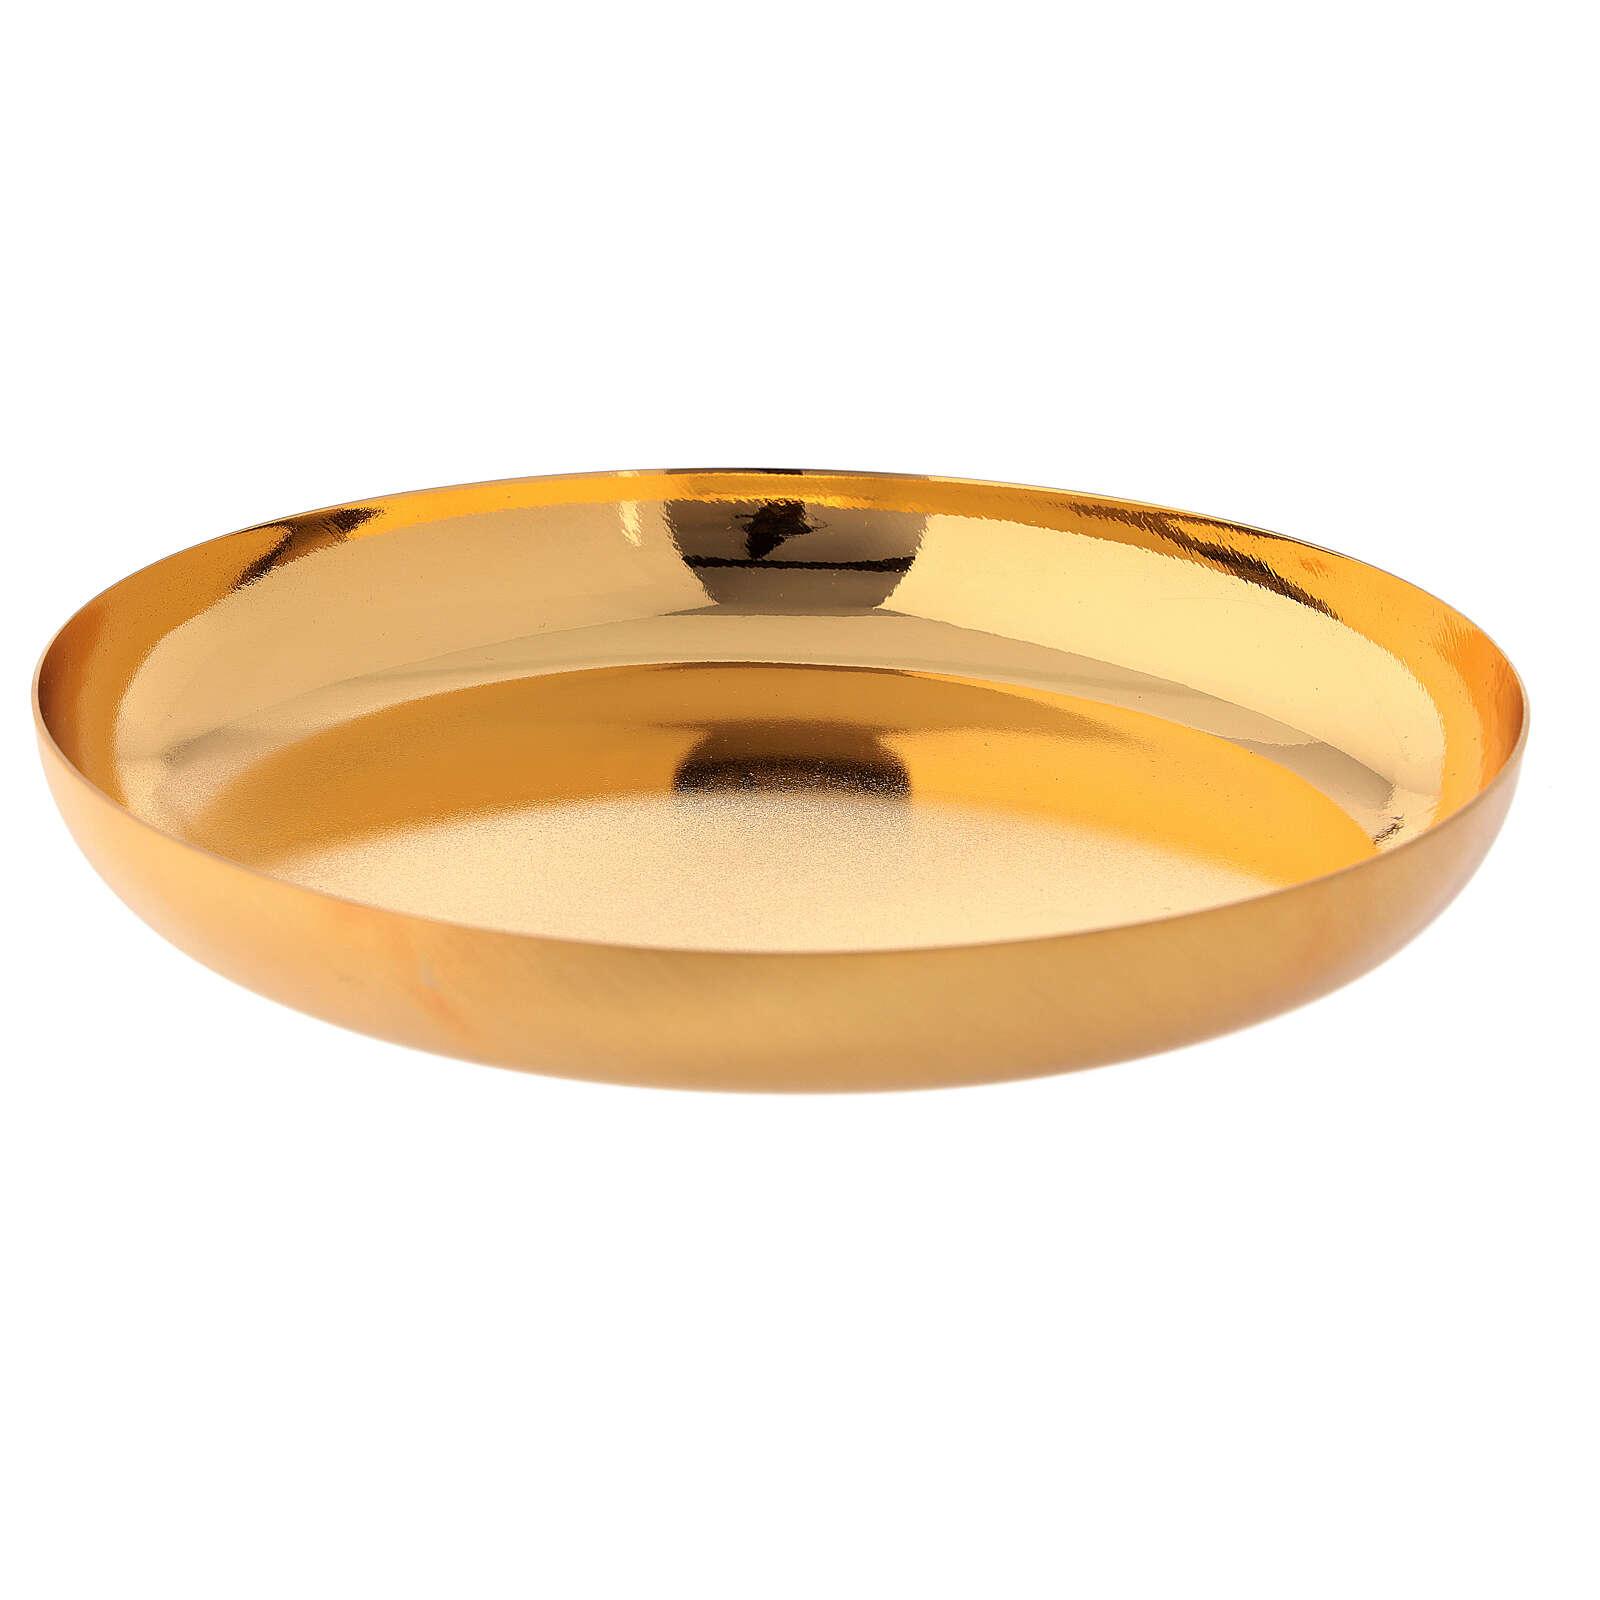 Patena latón dorado lúcido flato fondo 16 cm 4